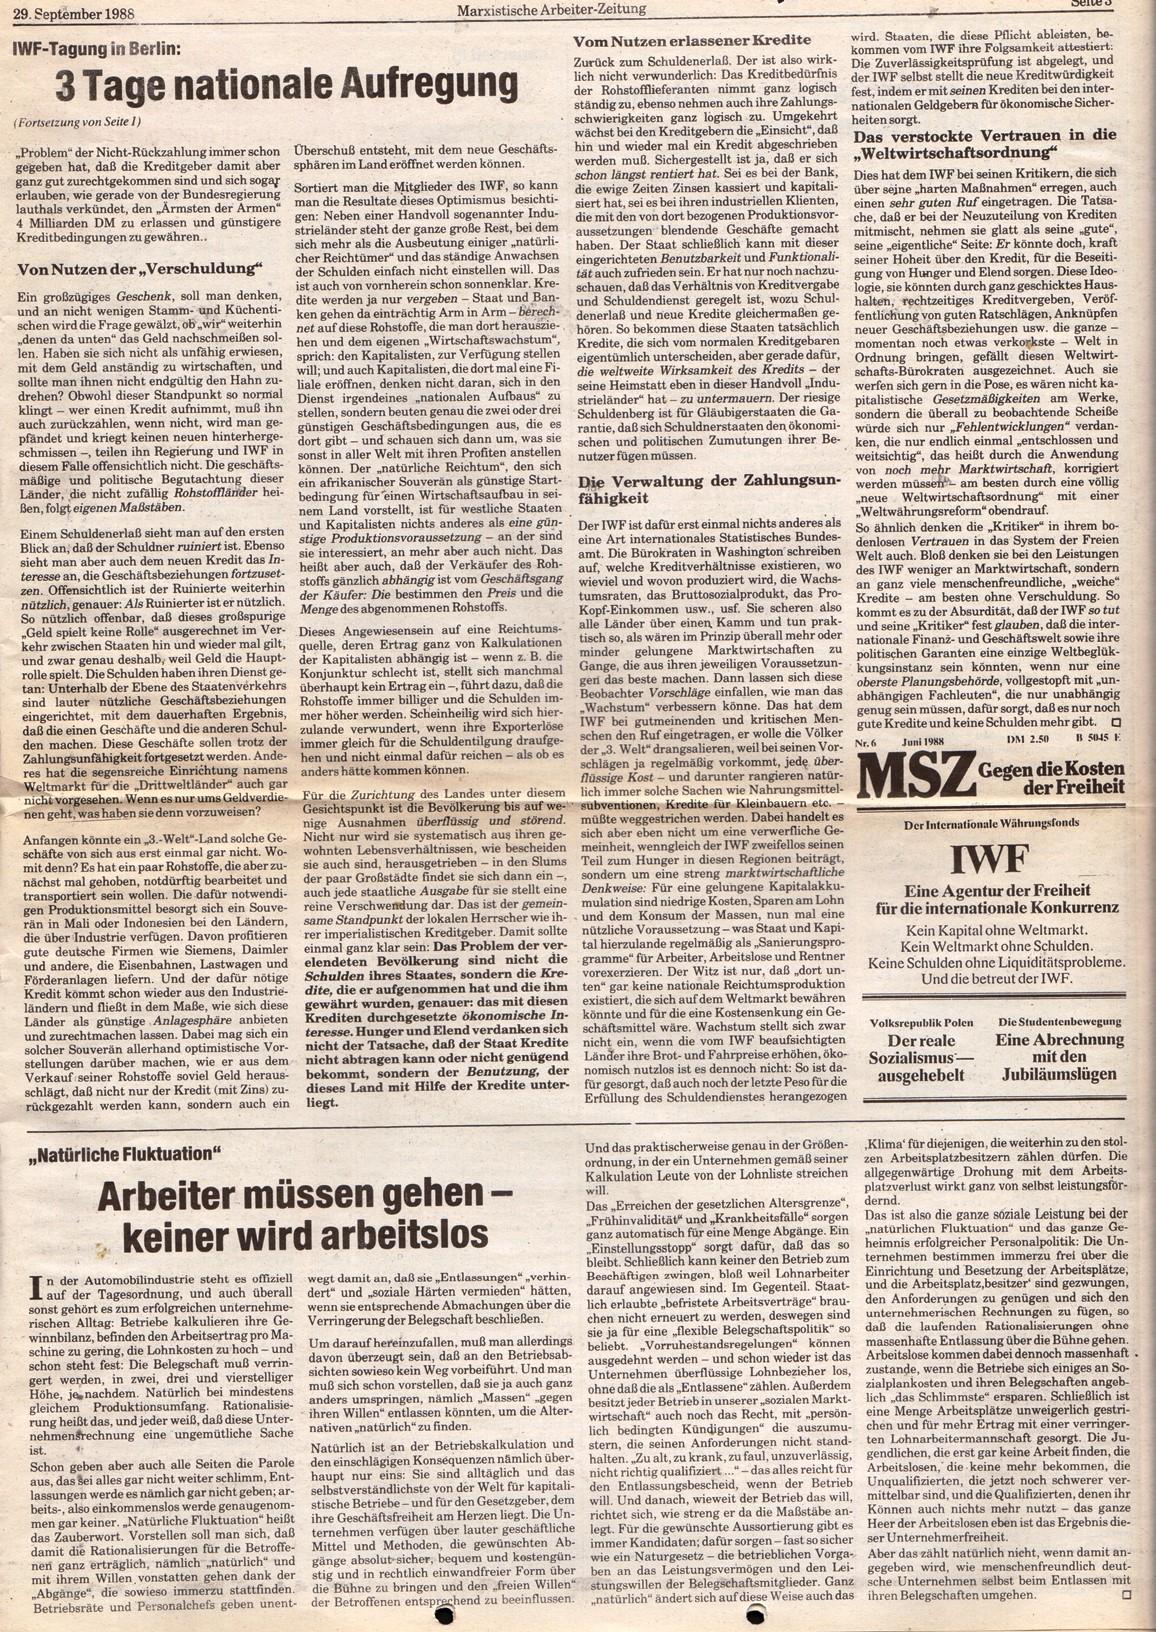 Muenchen_MG_MAZ_19880929_03